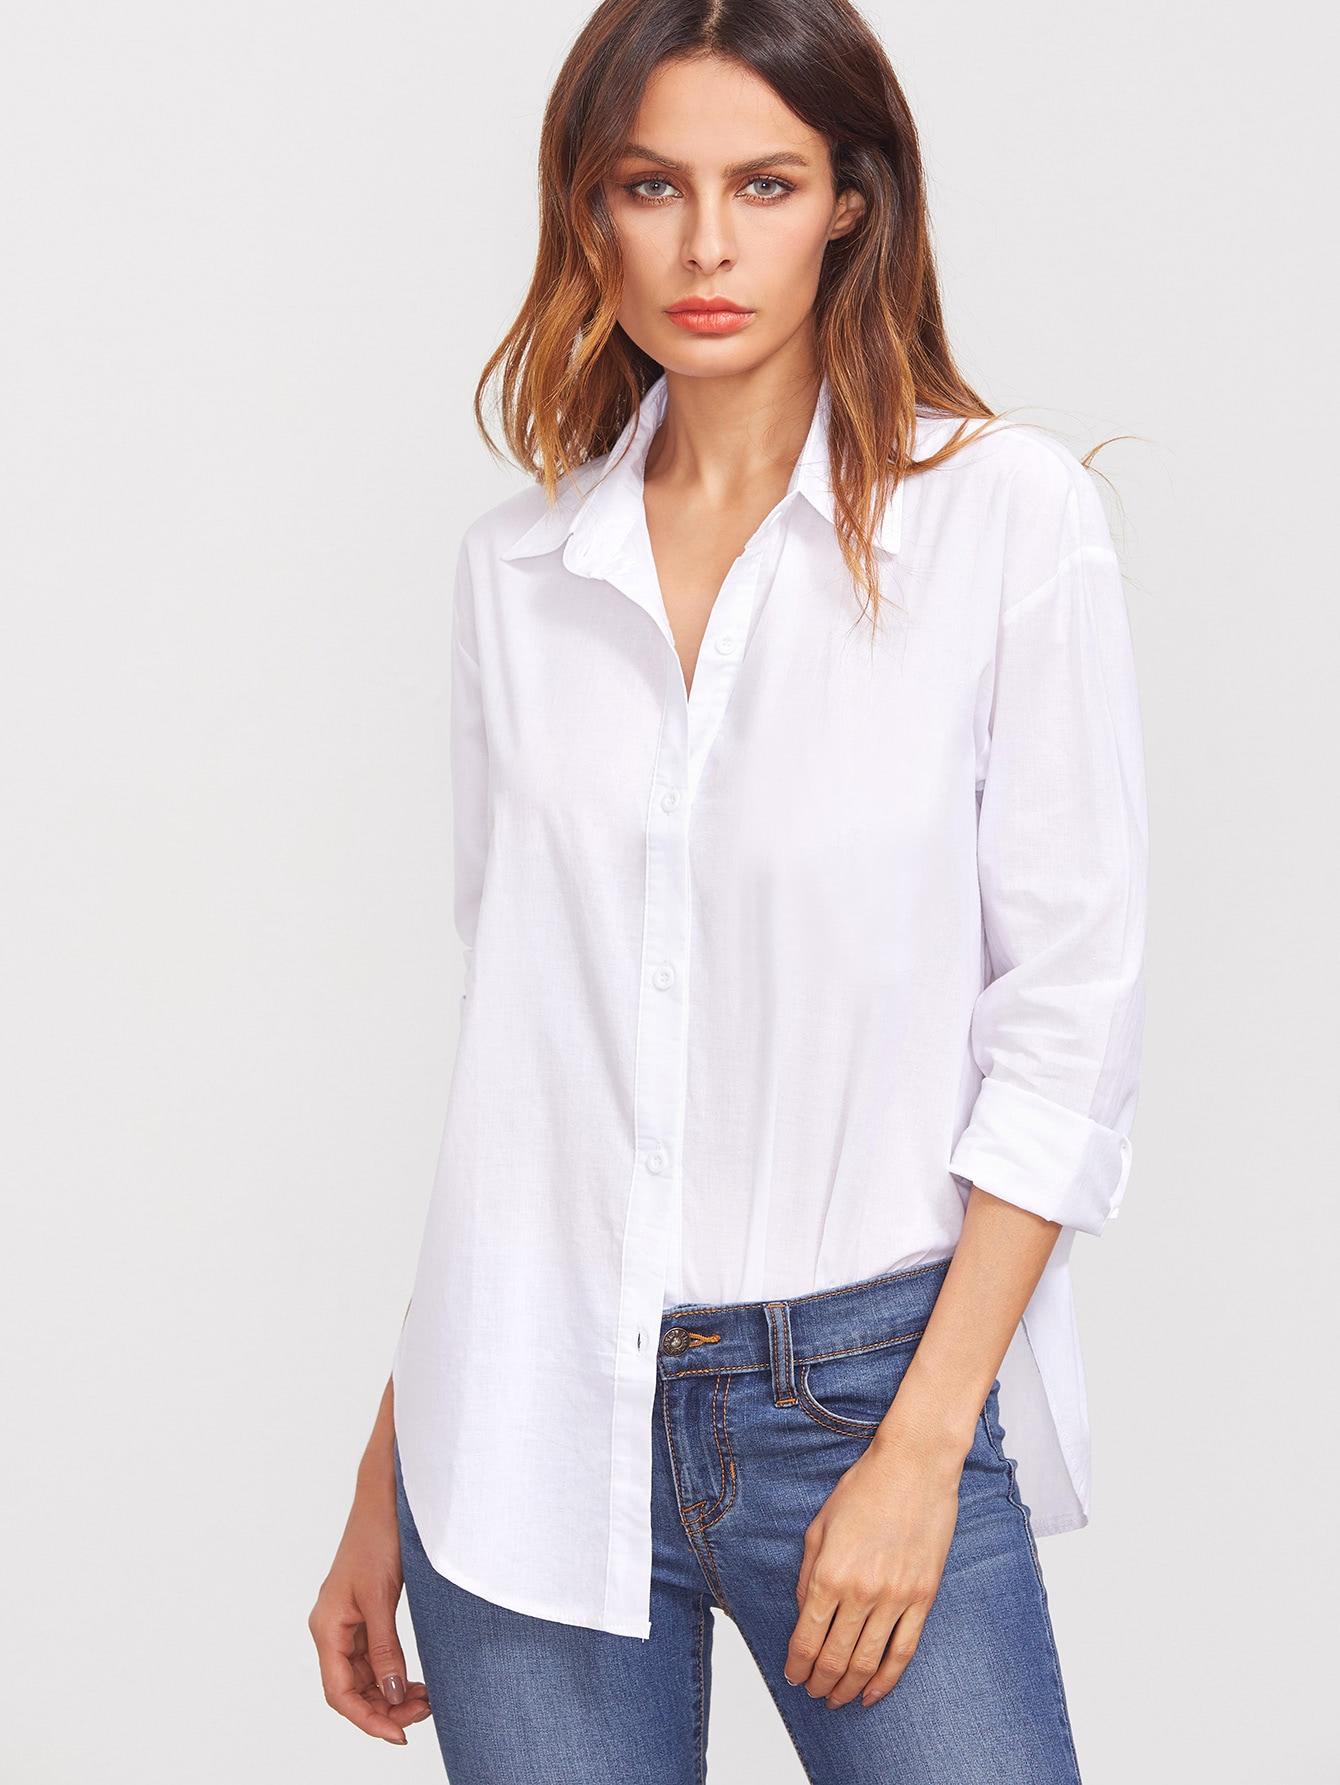 blouse col revers manche longue avec bouton blanc french romwe. Black Bedroom Furniture Sets. Home Design Ideas